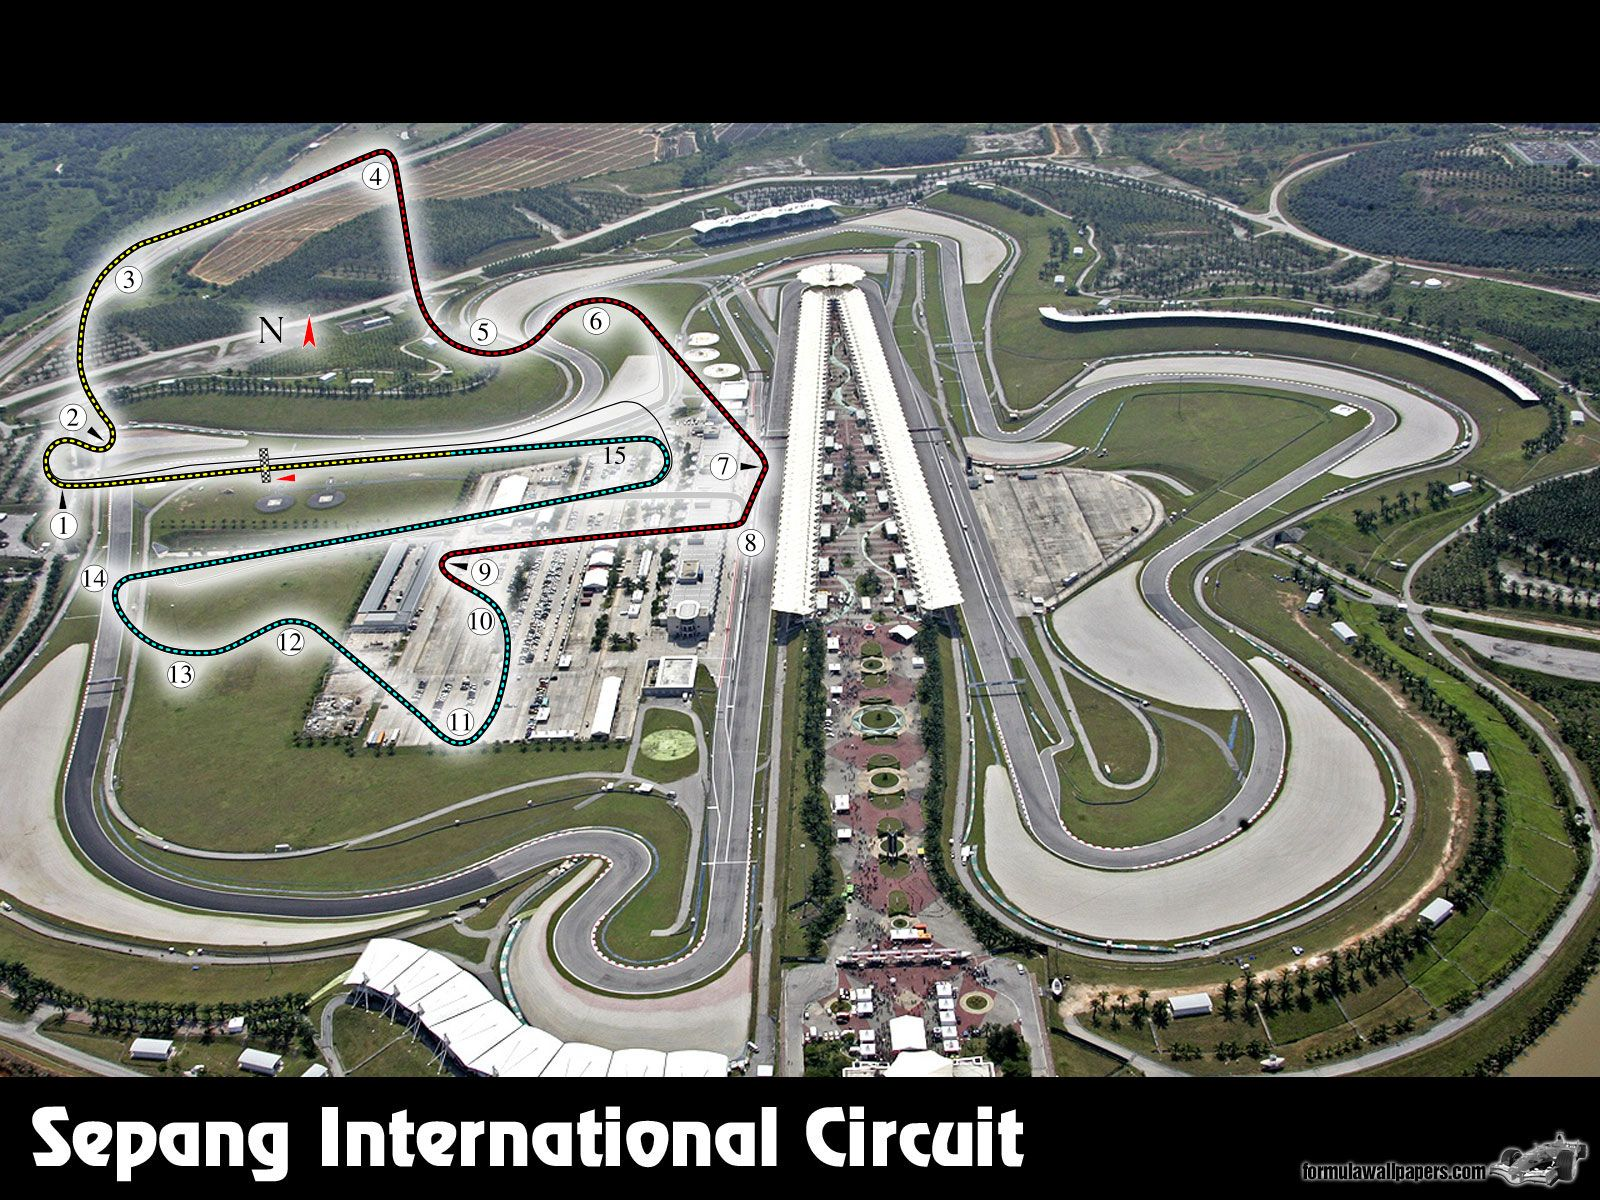 Sepang International Circuit (With images) Sepang, Circuit